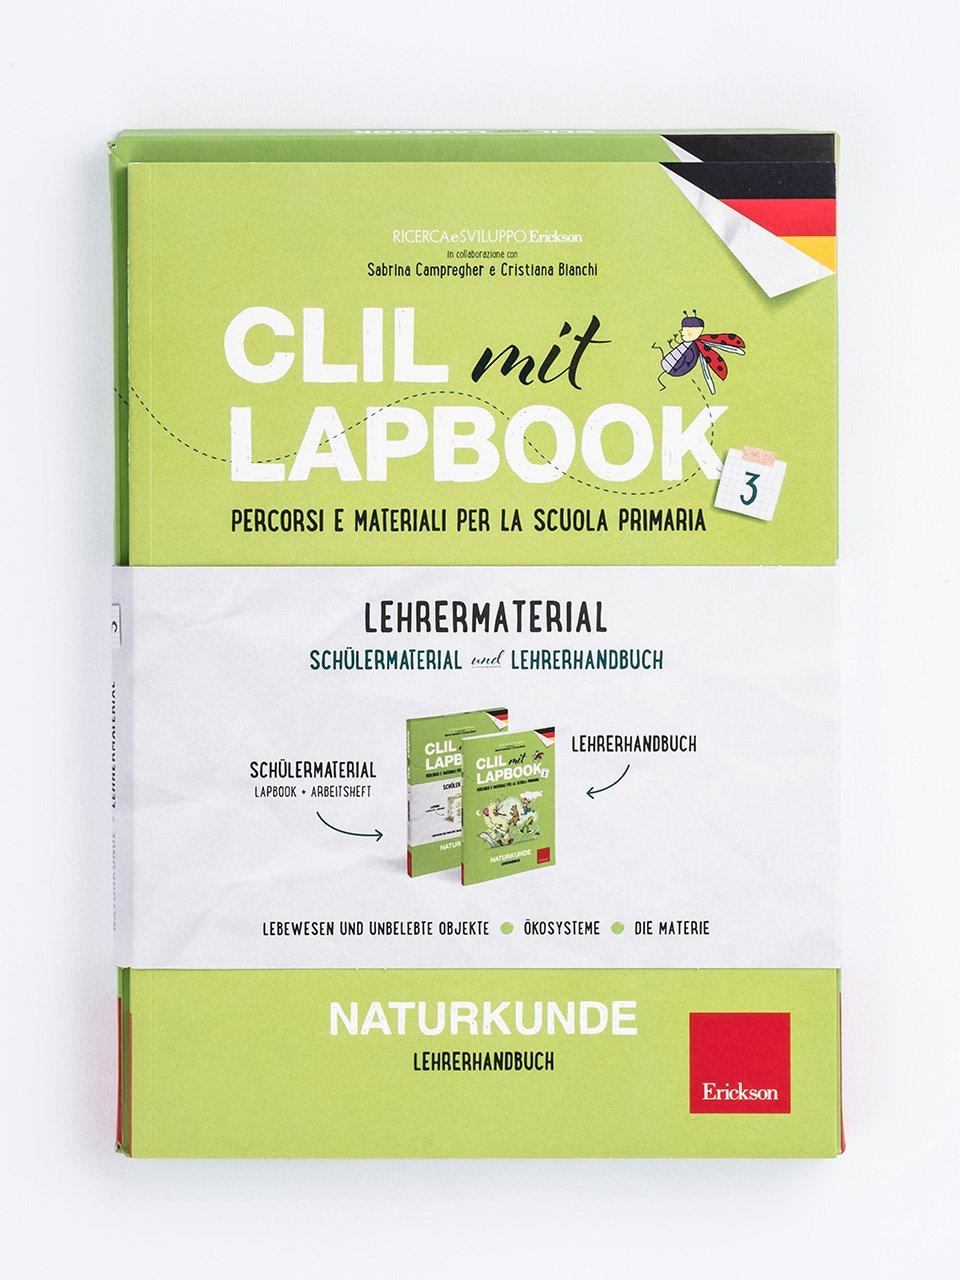 CLIL mit LAPBOOK - Naturkunde - Classe terza - Ricerca e Sviluppo Erickson  - Erickson